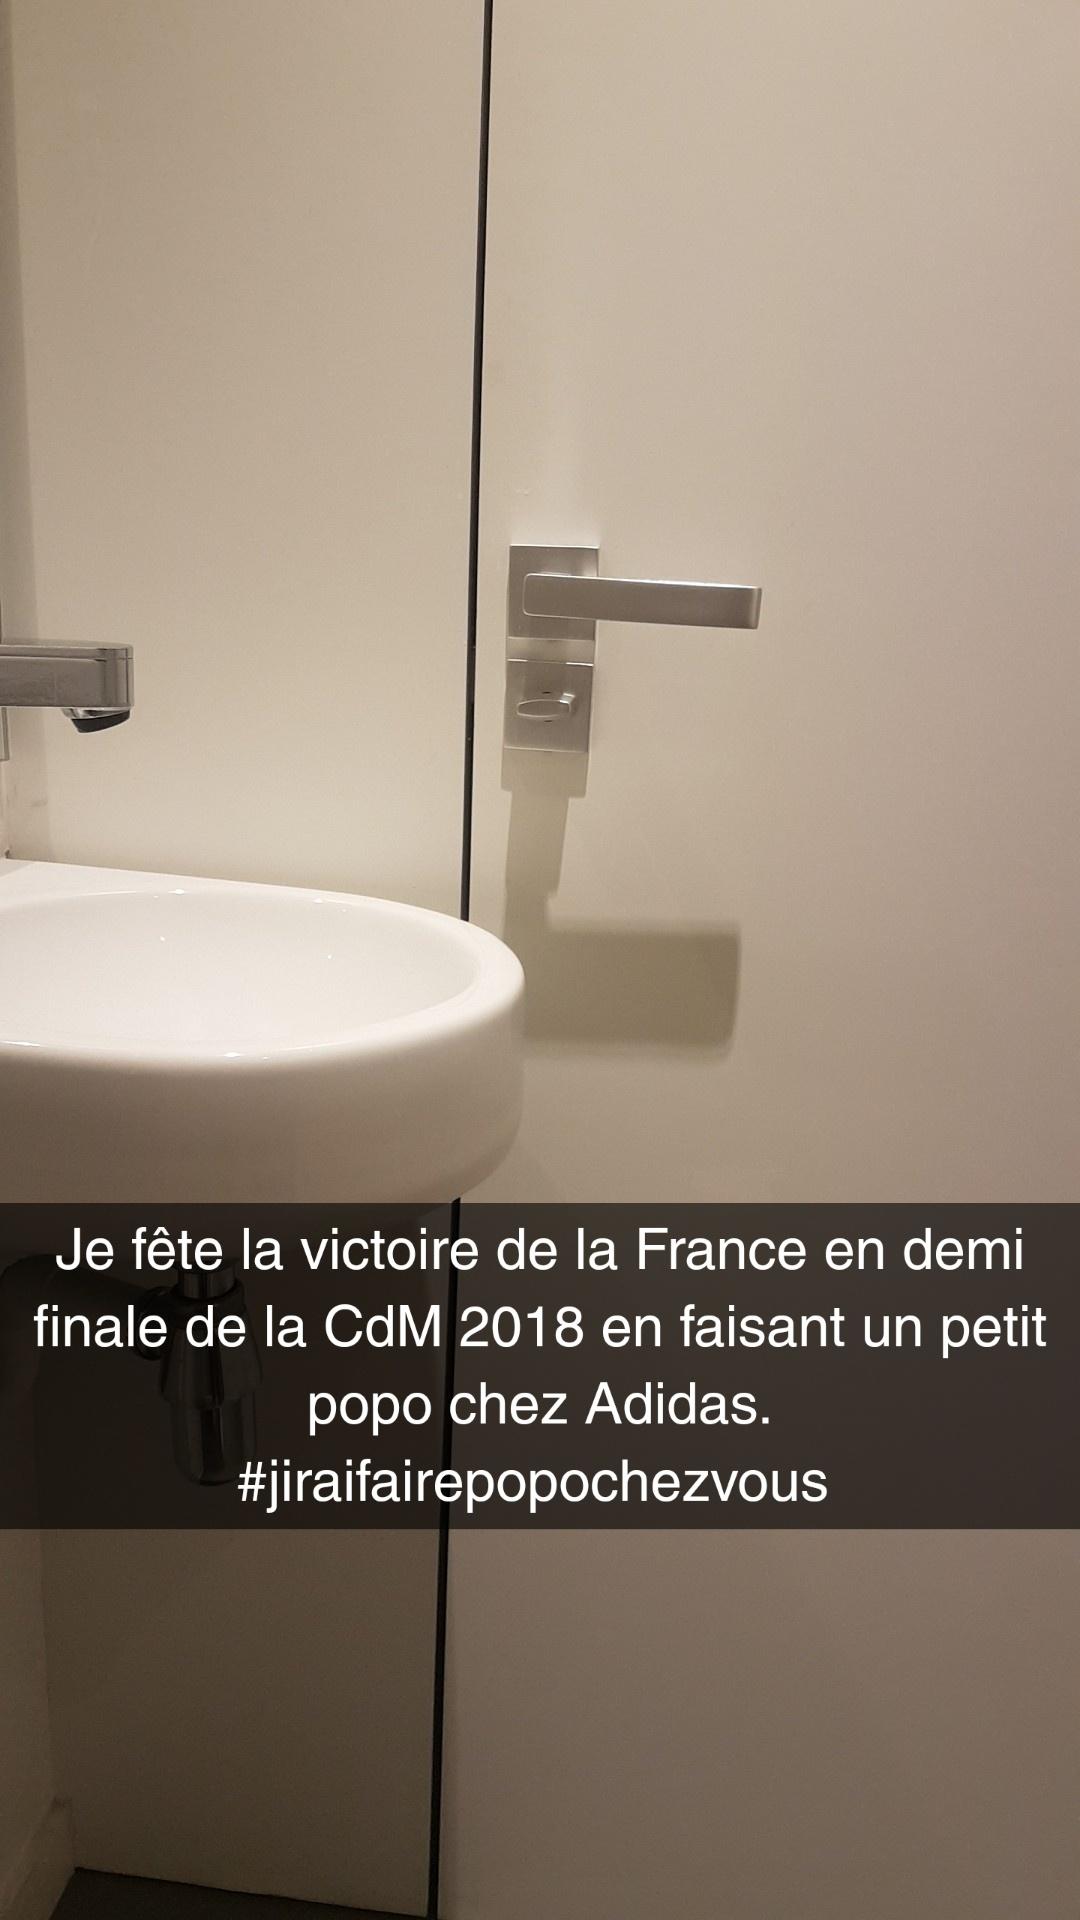 Adidas « Paname » | #jiraifairepopochezvous